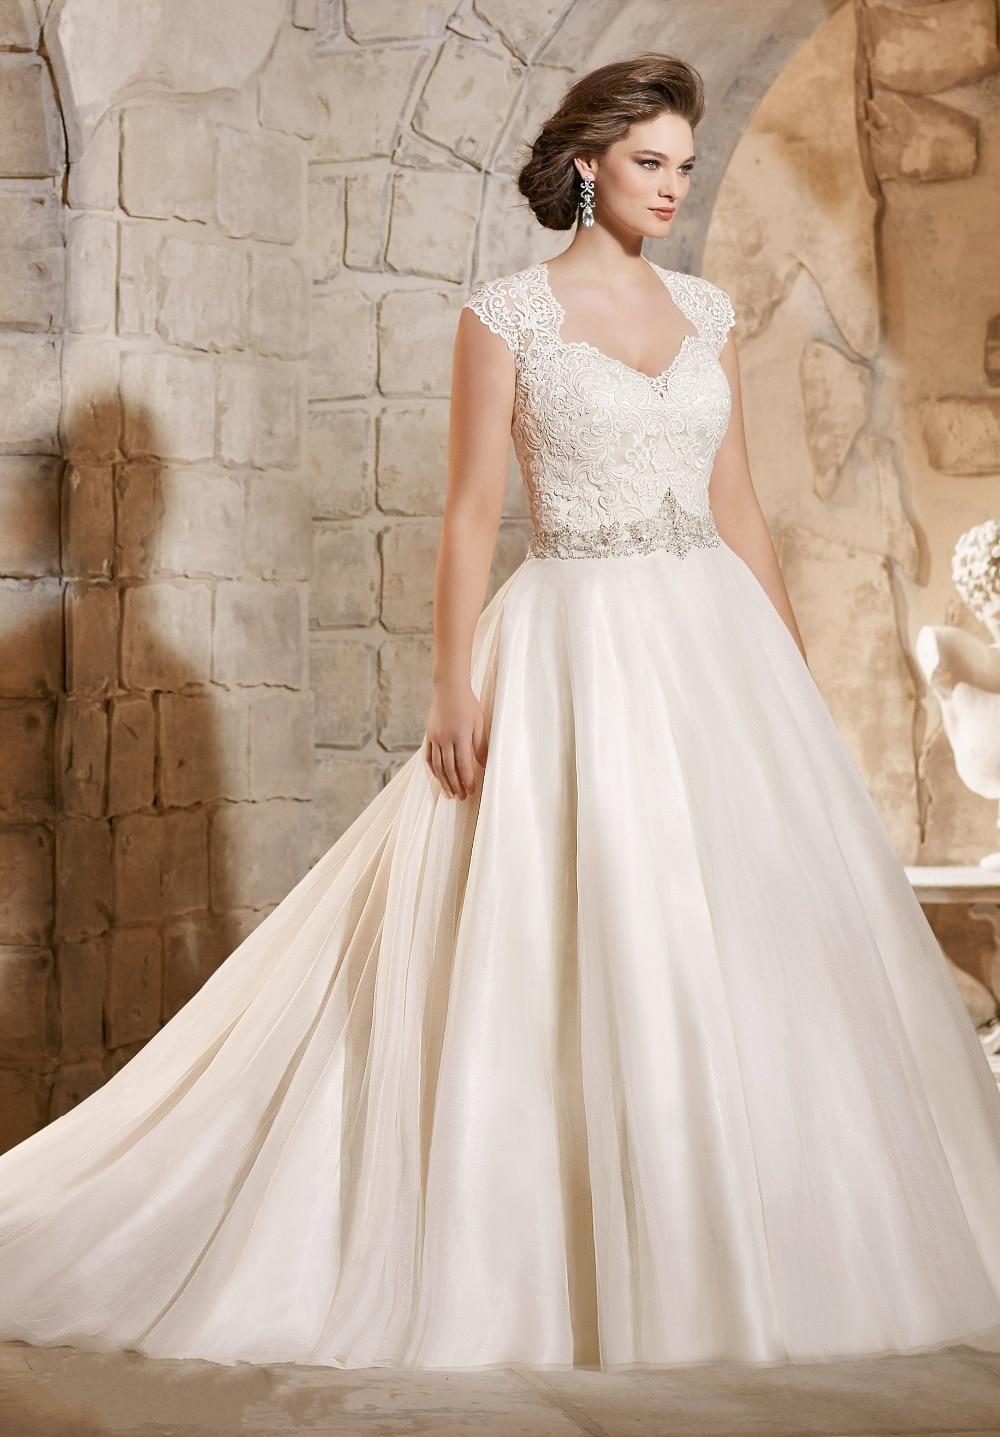 a dress sleeve short sleeve wedding dress Conservative Short Sleeved V Neck Beaded Wedding Dress